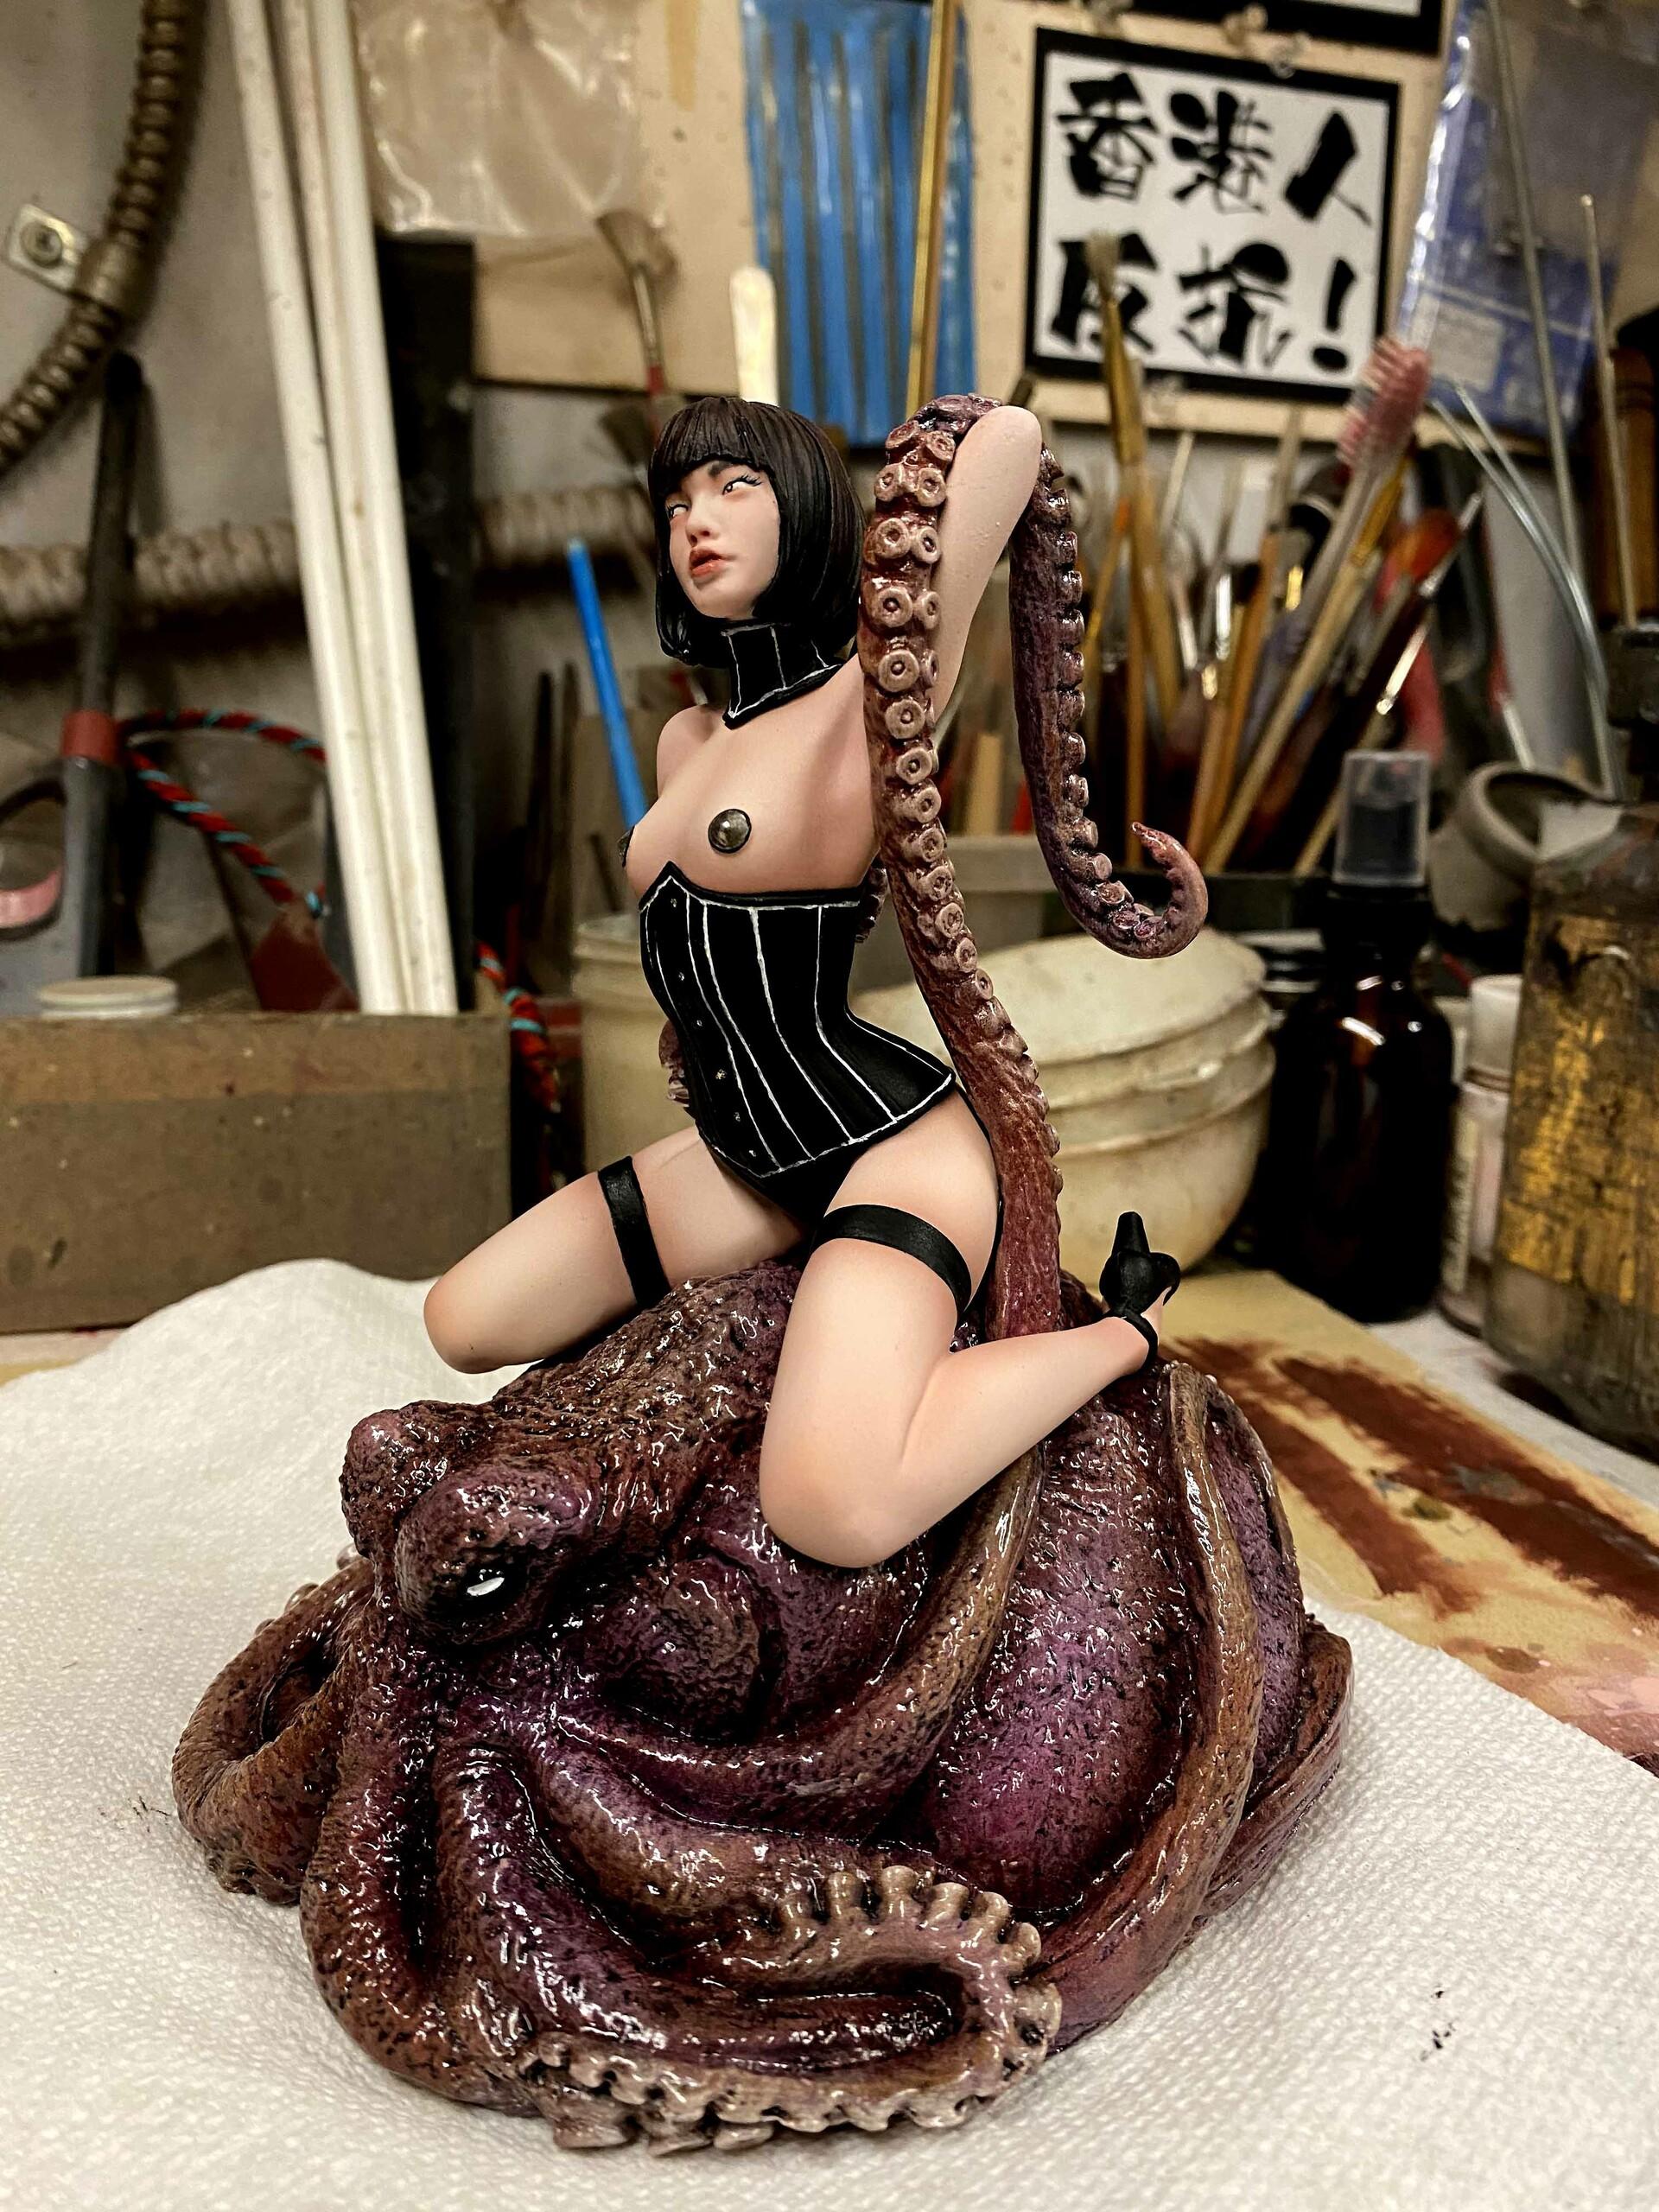 Octopus Girl  W.I.P.  https://www.solidart.club/